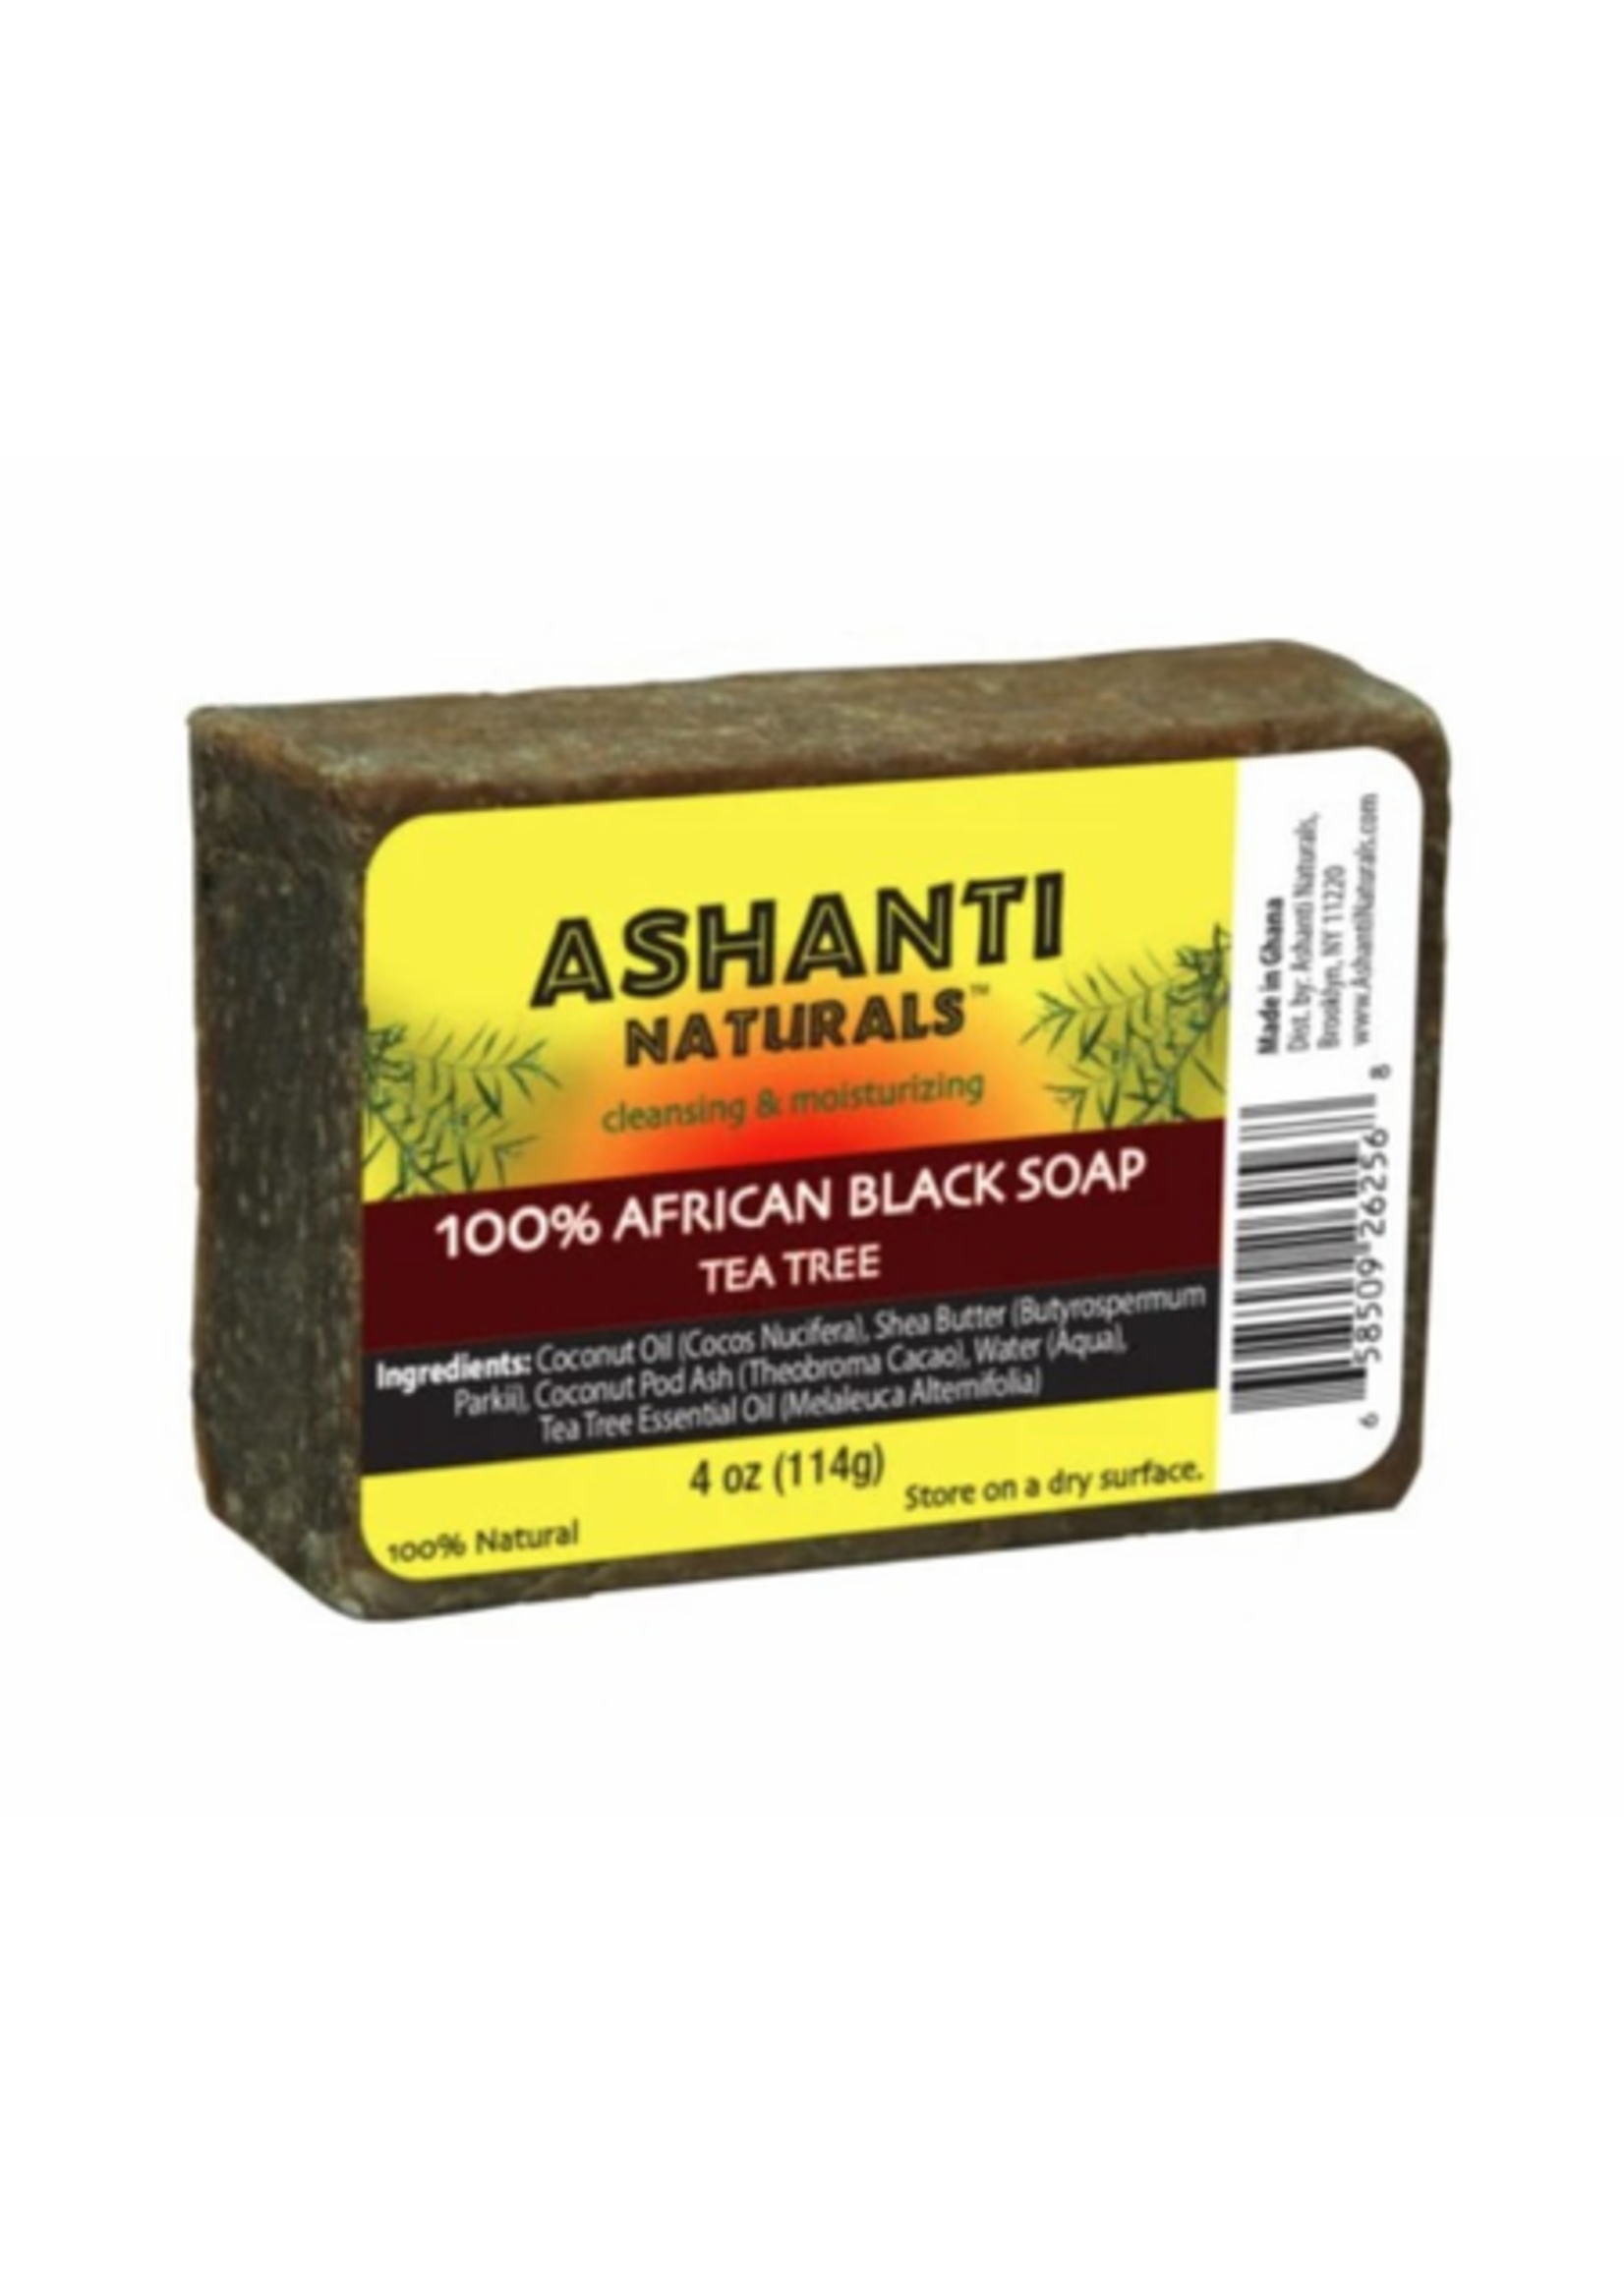 Ashanti African Black Soap Tea Tree